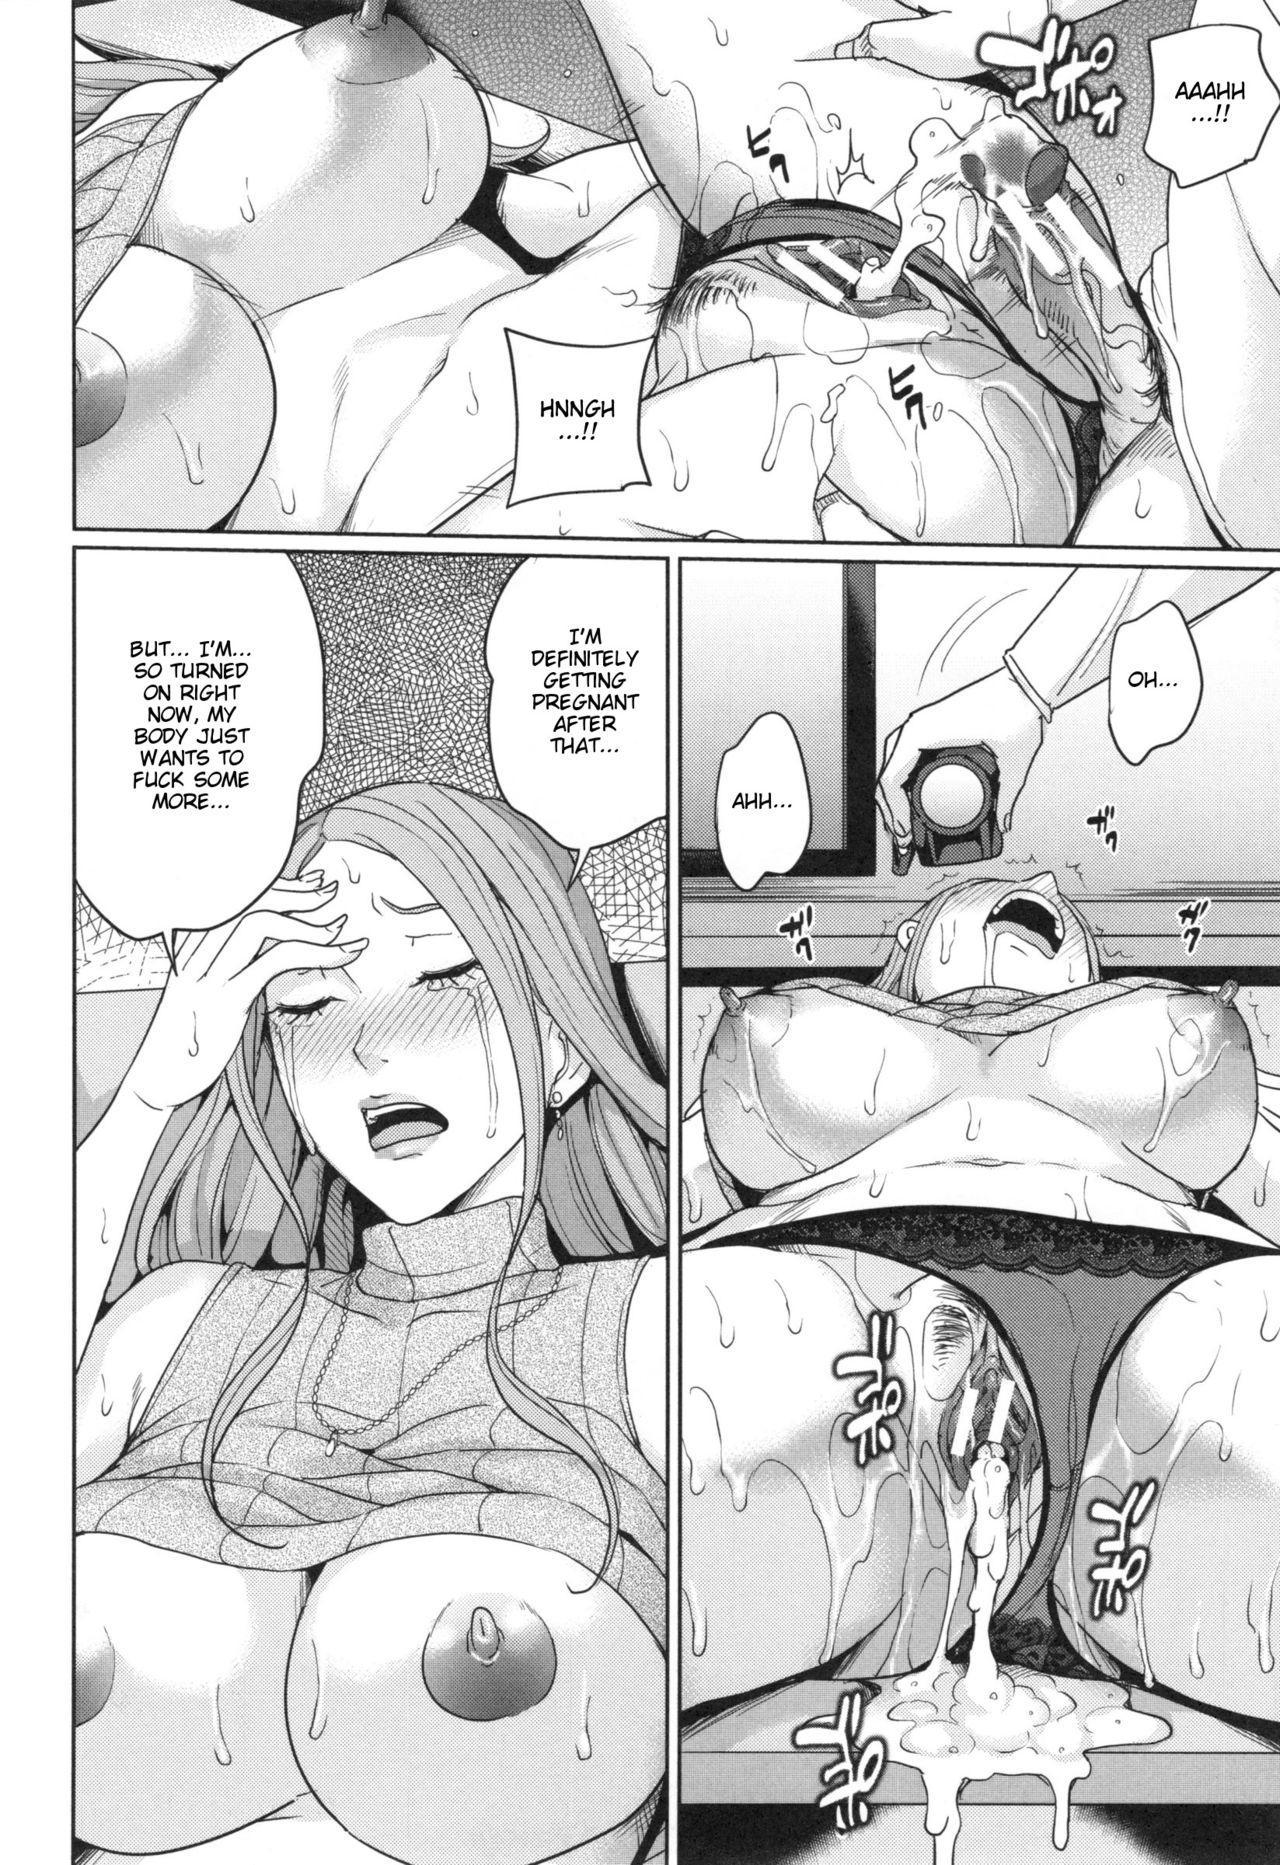 [Maimu-Maimu] Aniyome Bitch Life | Sister-in-Law Slut Life [English] {Taihen Zombii} 180